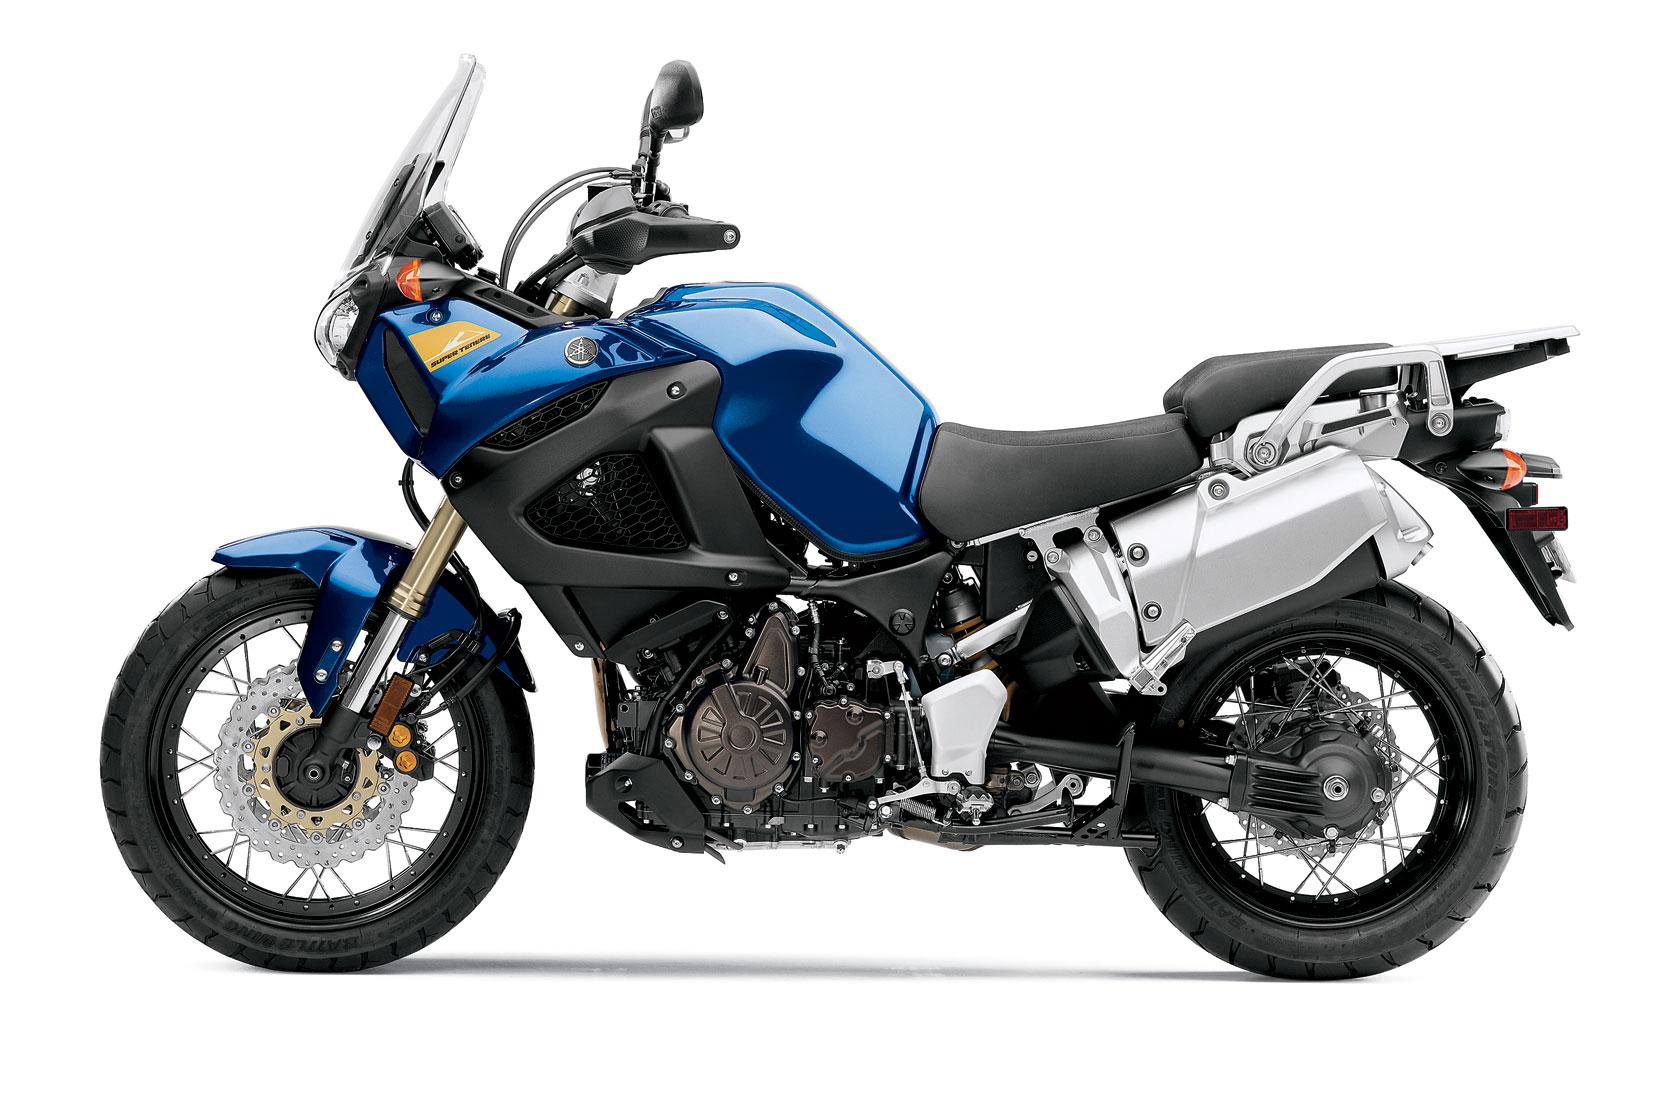 Yamaha Super Tenere Horsepower And Torque